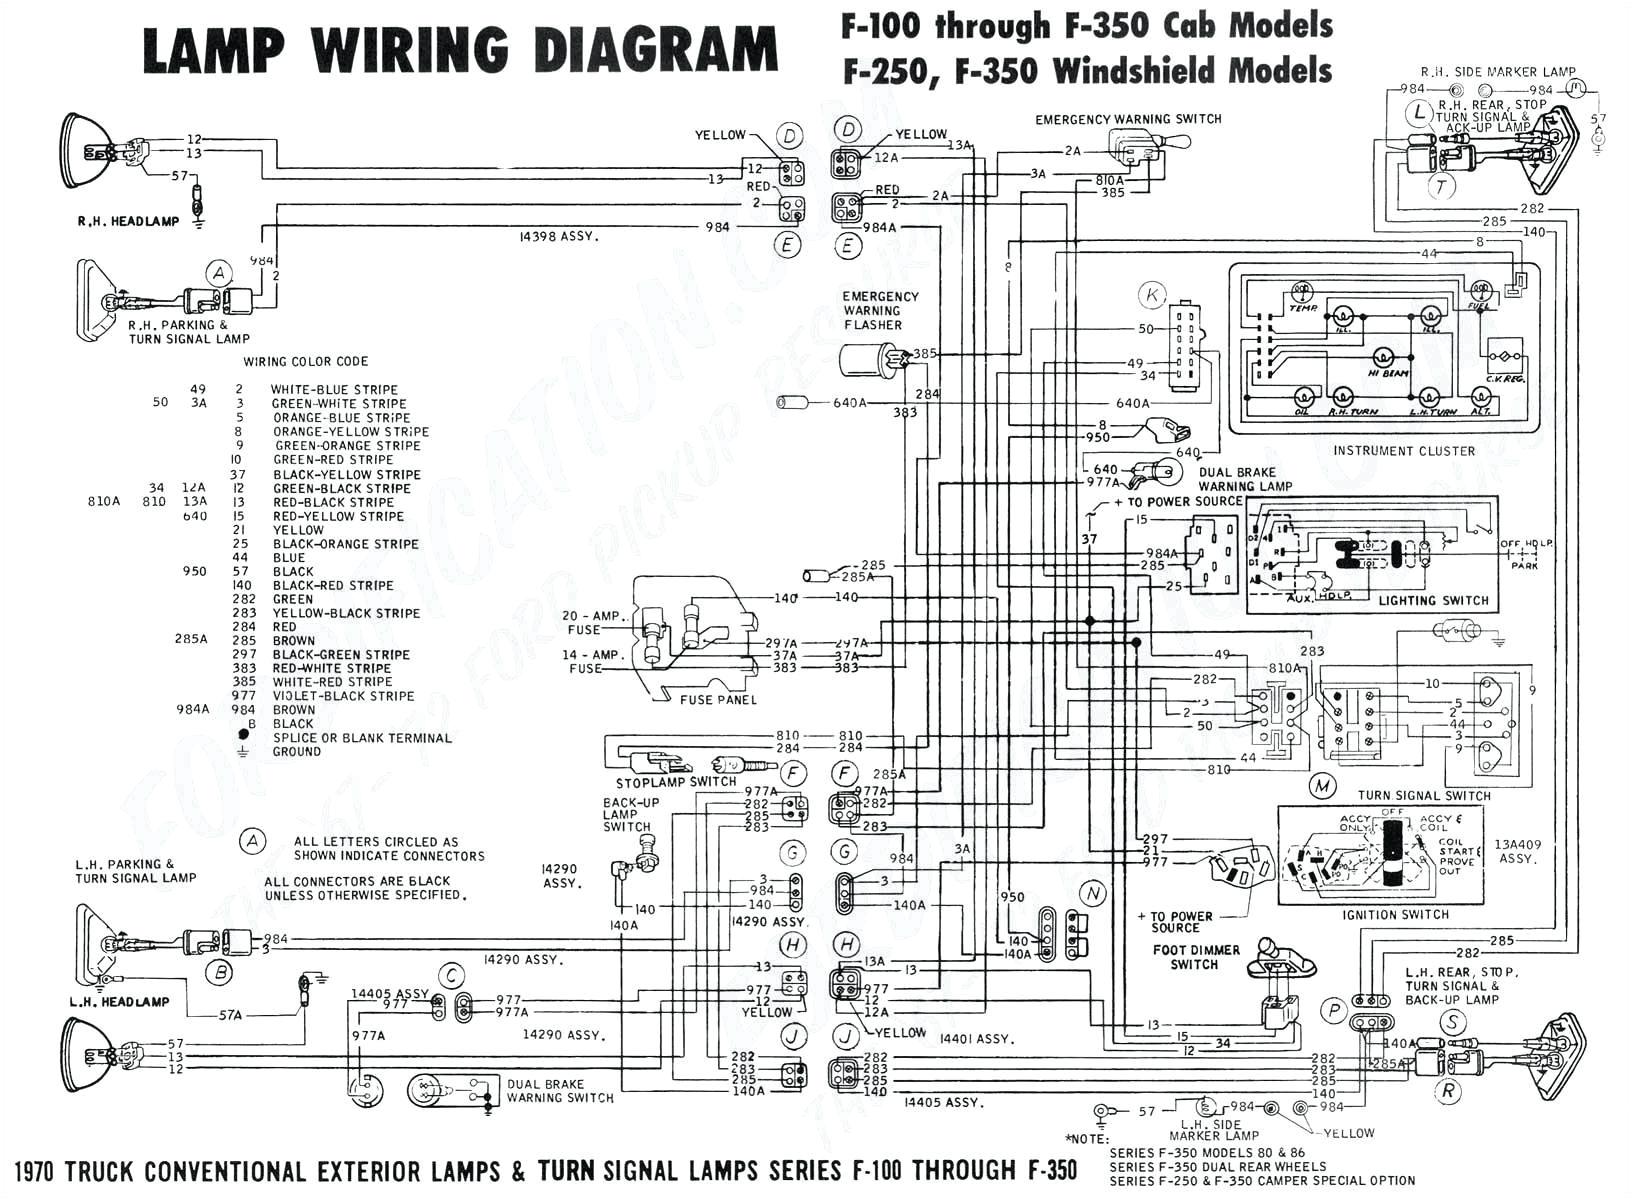 electric kes wiring diagram schema diagram database electric kes wiring diagram blog wiring diagram electric kes